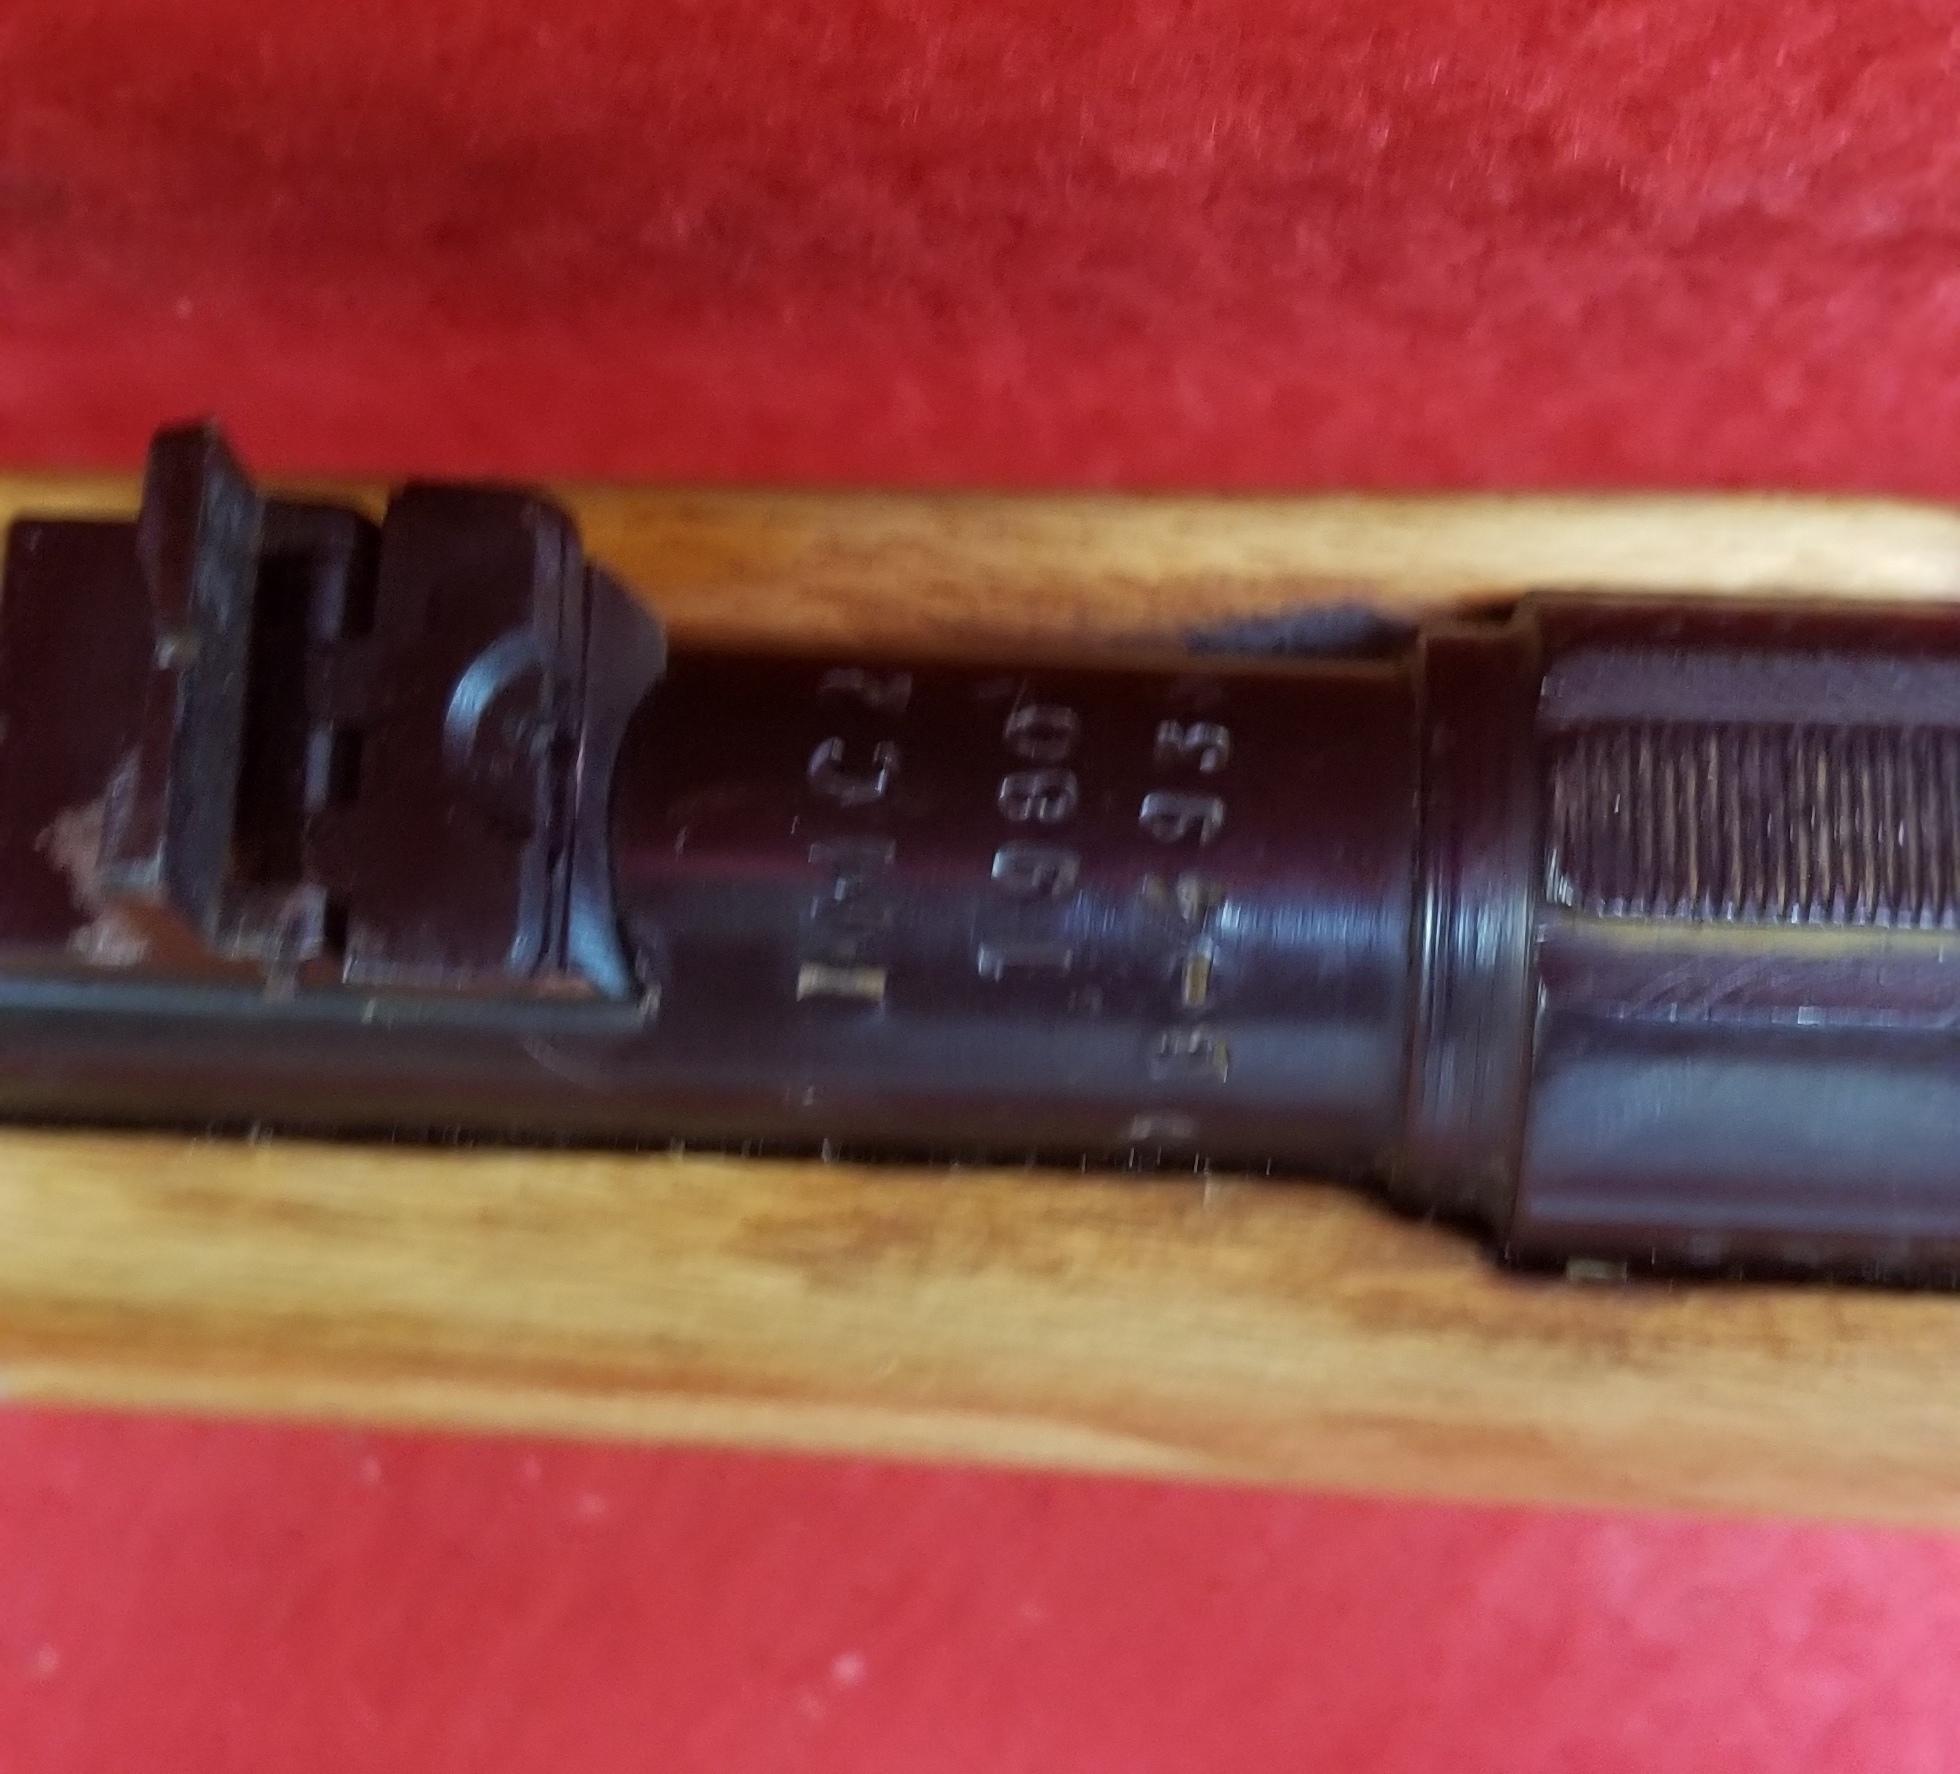 IMC2 1980 22 LR -img-5